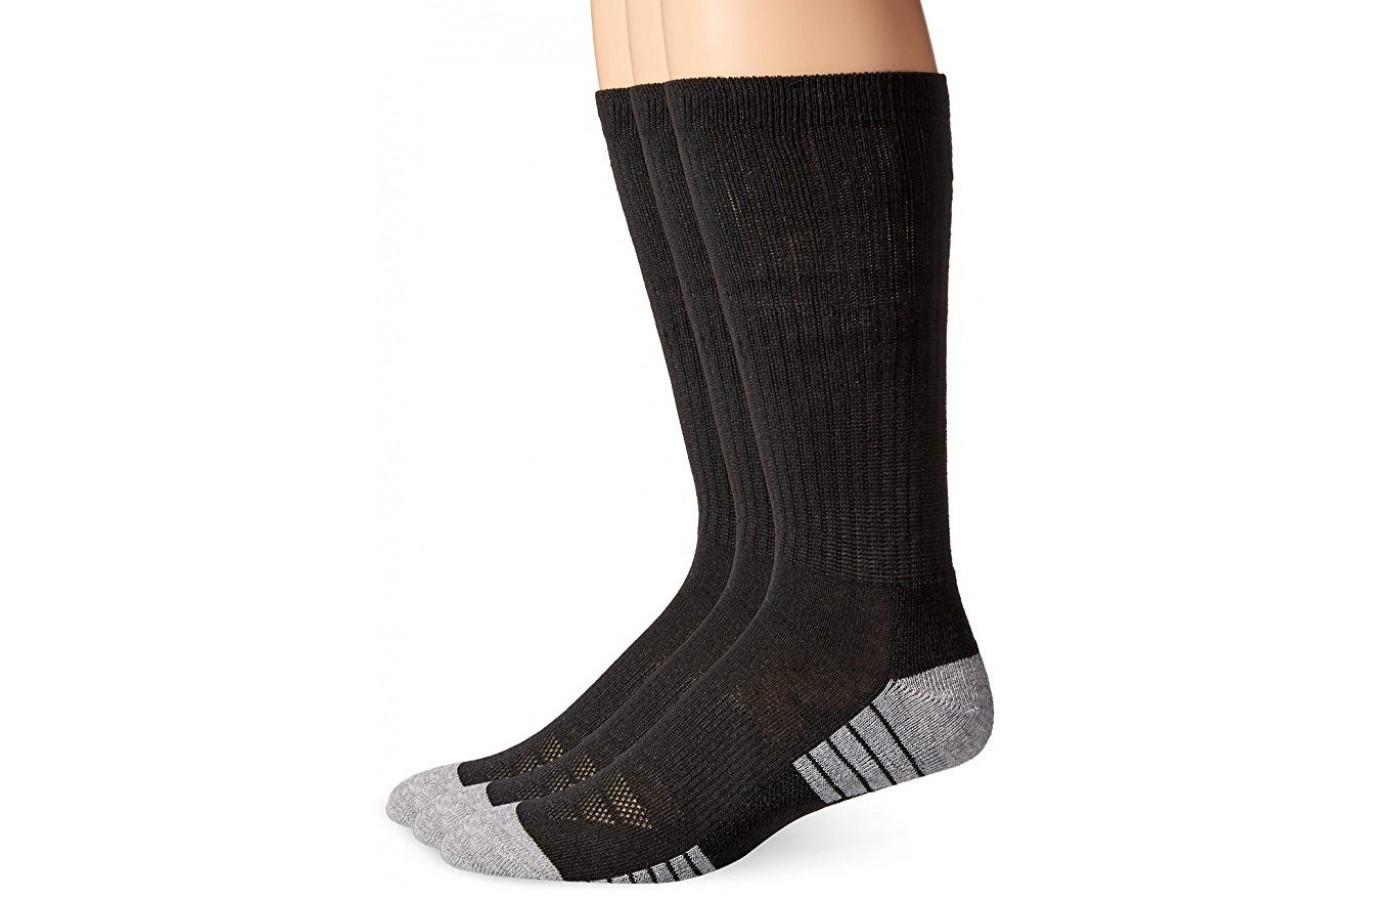 Under Armour Heatgear Socks Side